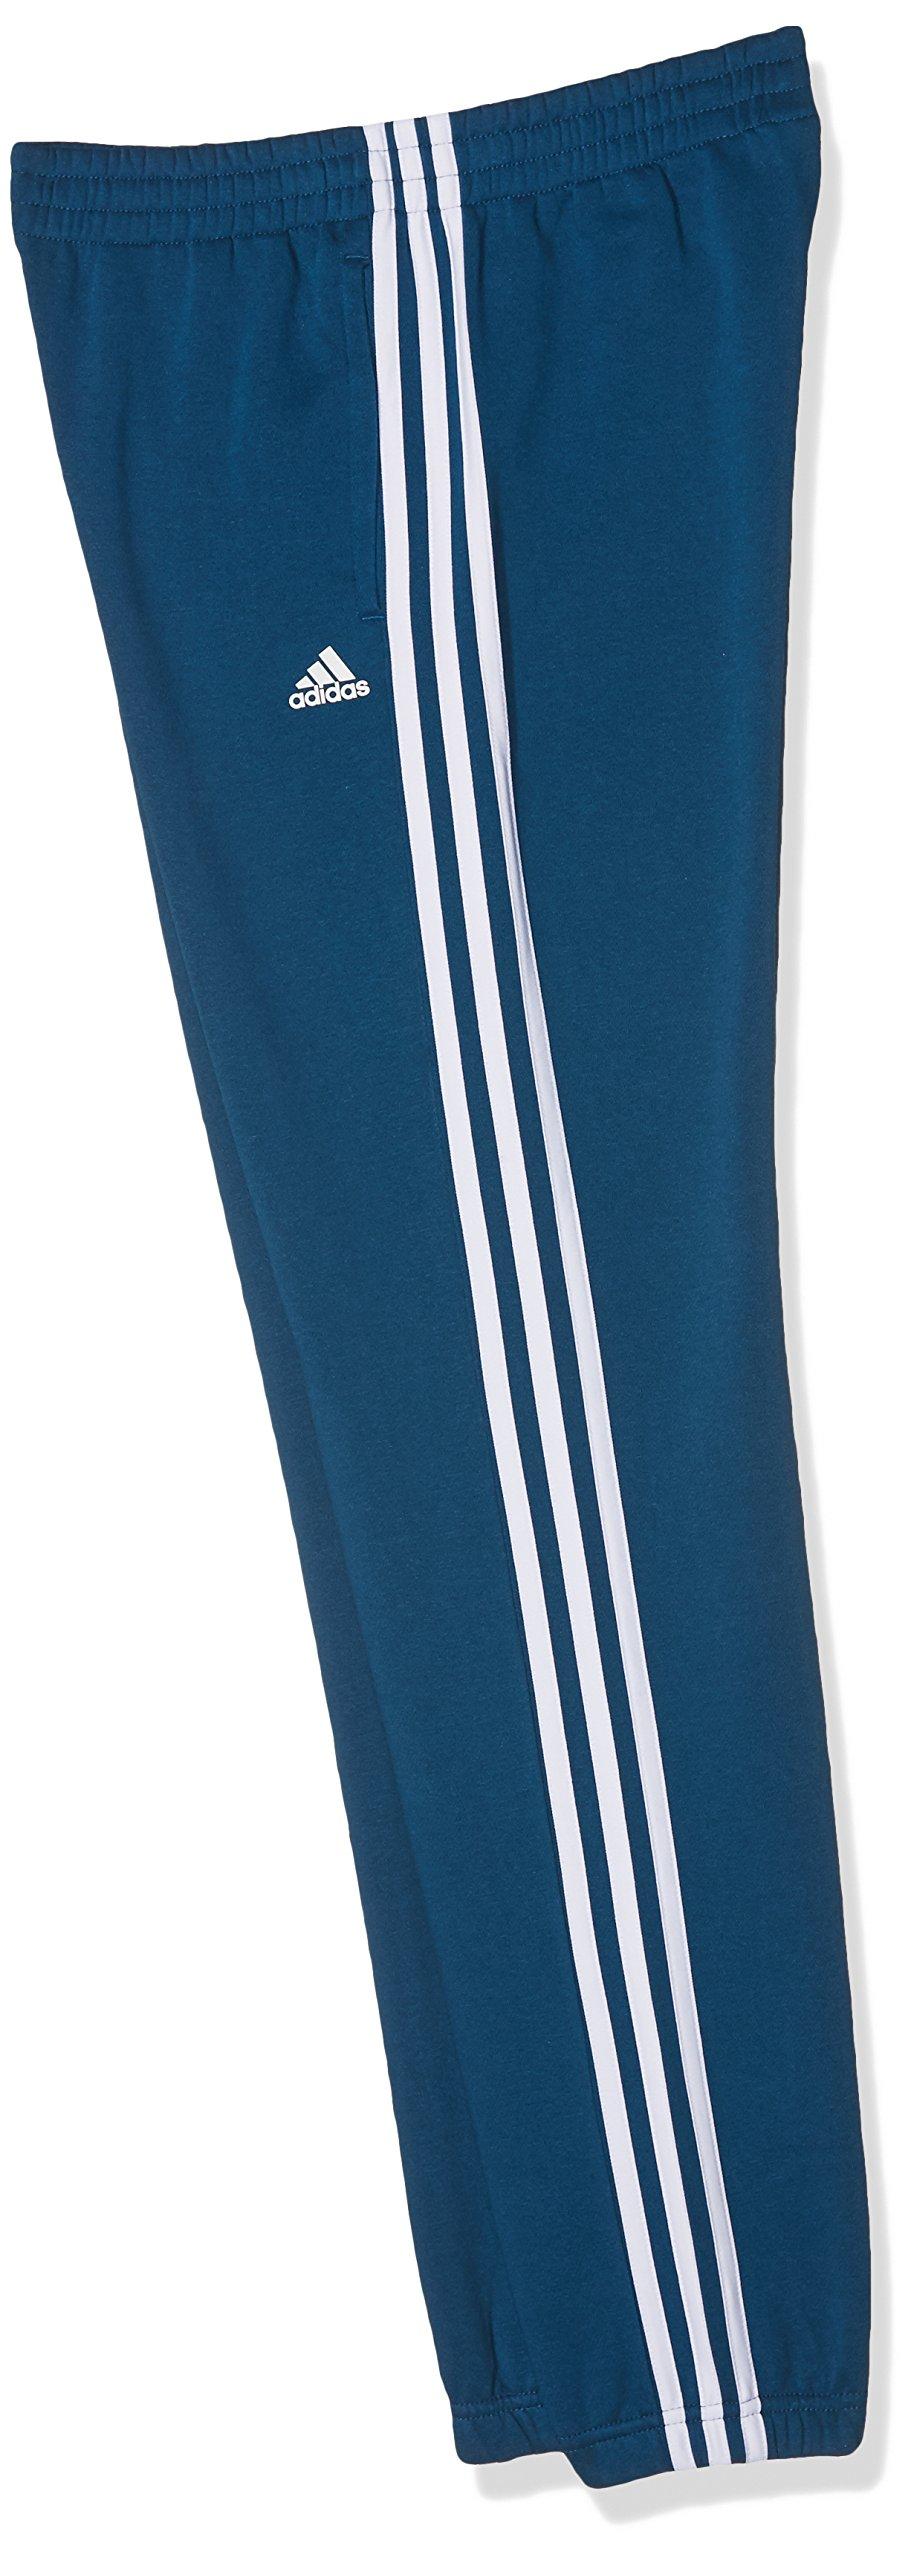 adidas Boys Tracksuit Kids Athletics Hojo Training Running Blue Gym New (152/11-12 Years) by adidas (Image #2)